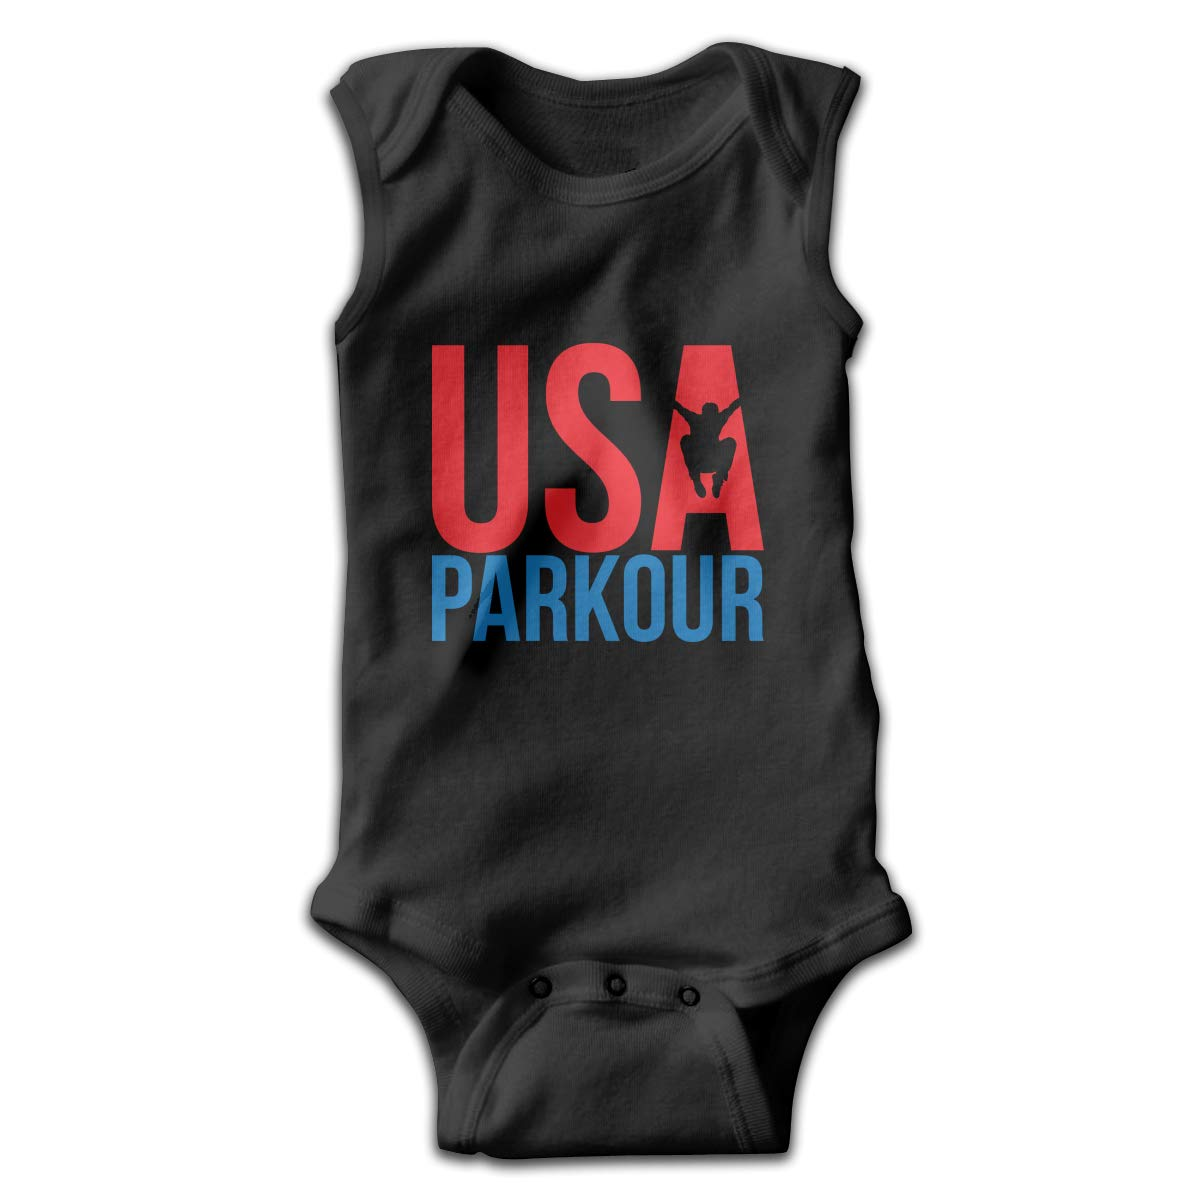 Efbj Toddler Baby Boys Rompers Sleeveless Cotton Jumpsuit,USA Parkour Bodysuit Autumn Pajamas